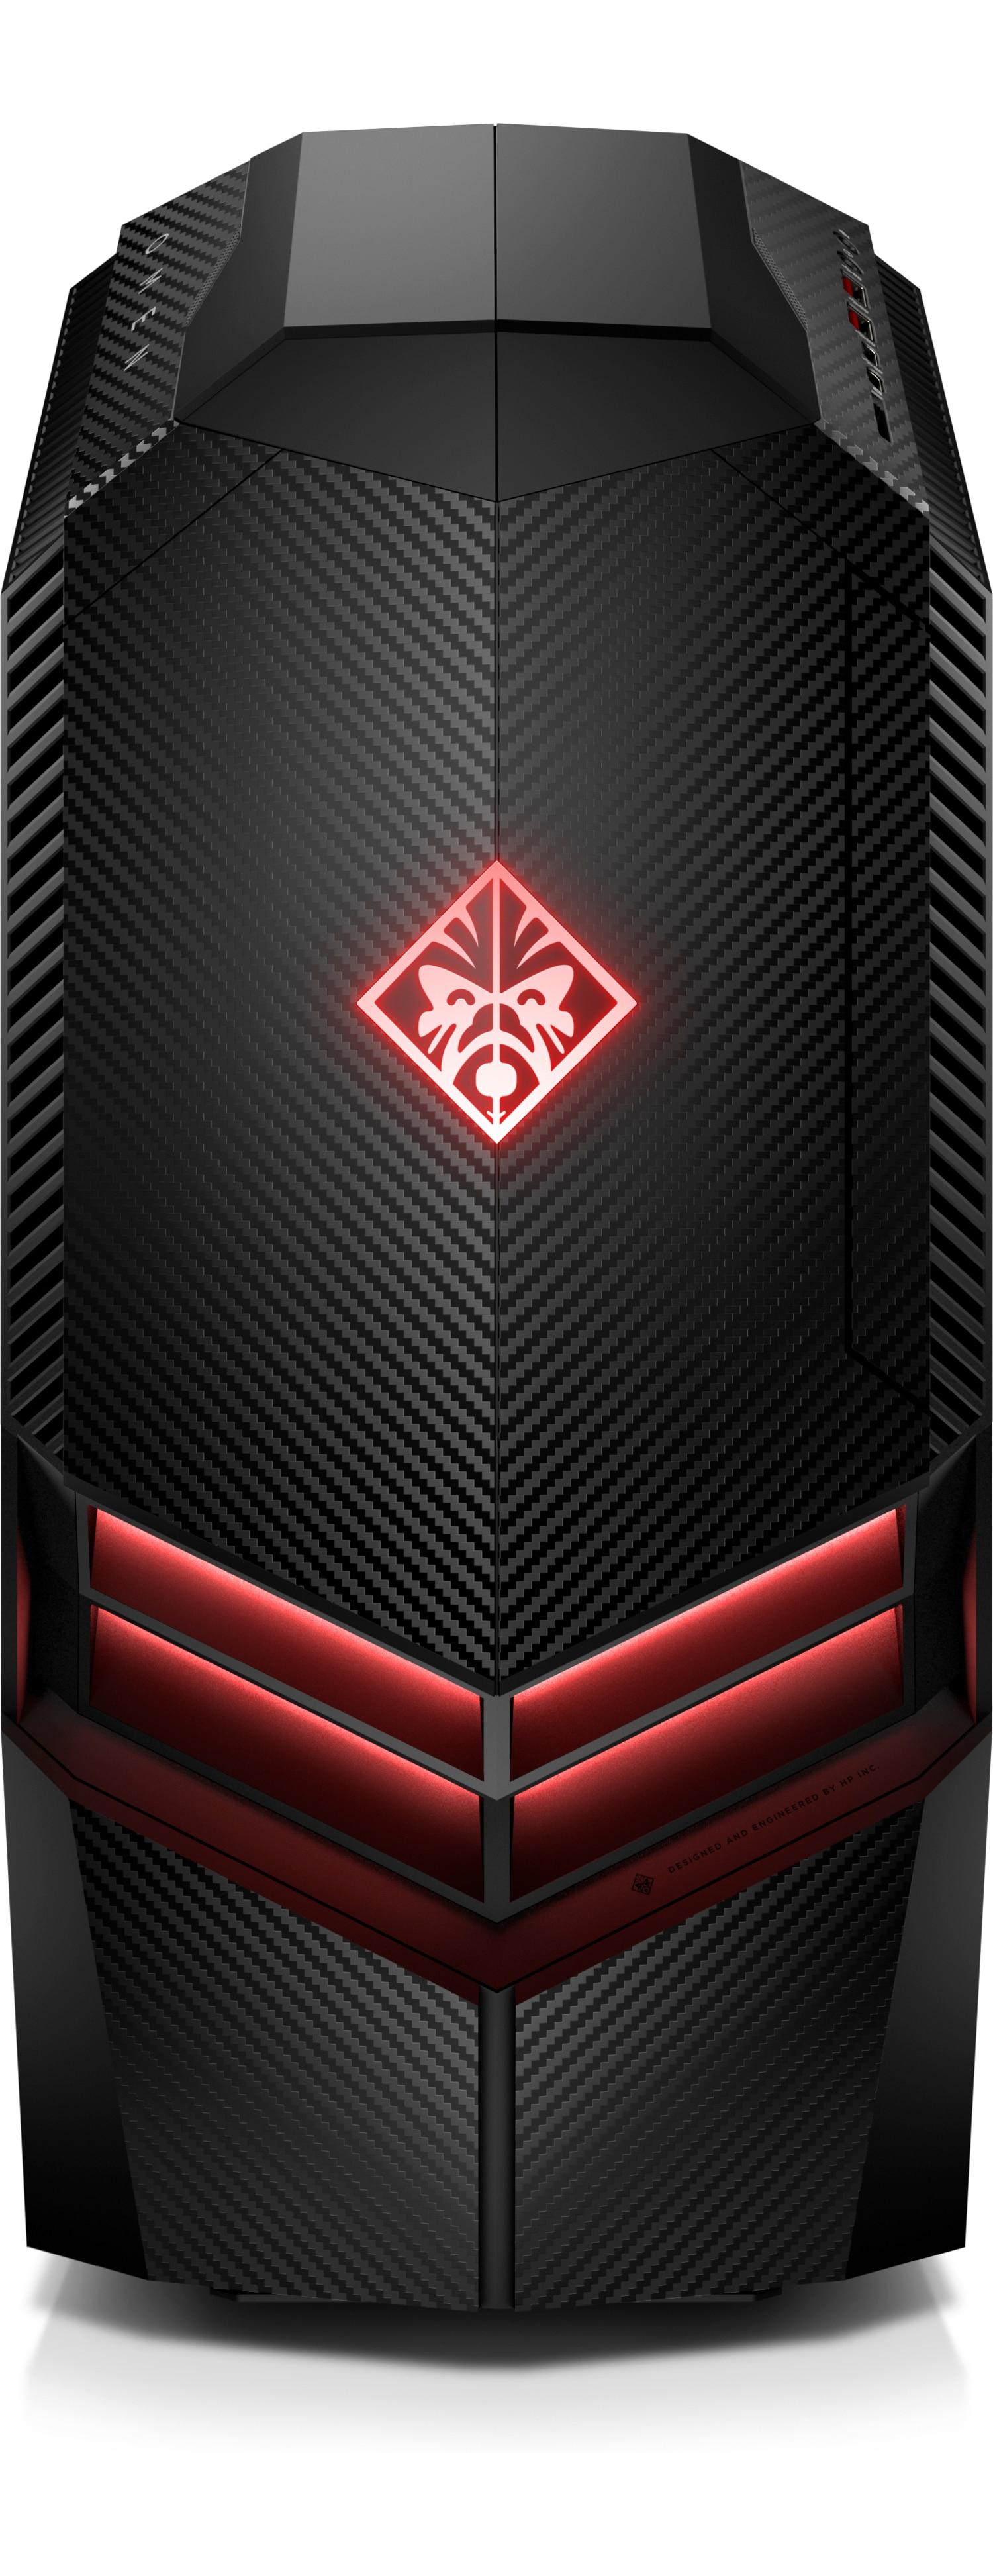 Hewlett Packard HP OMEN by 880 069ng Gaming Desktop PC AMD